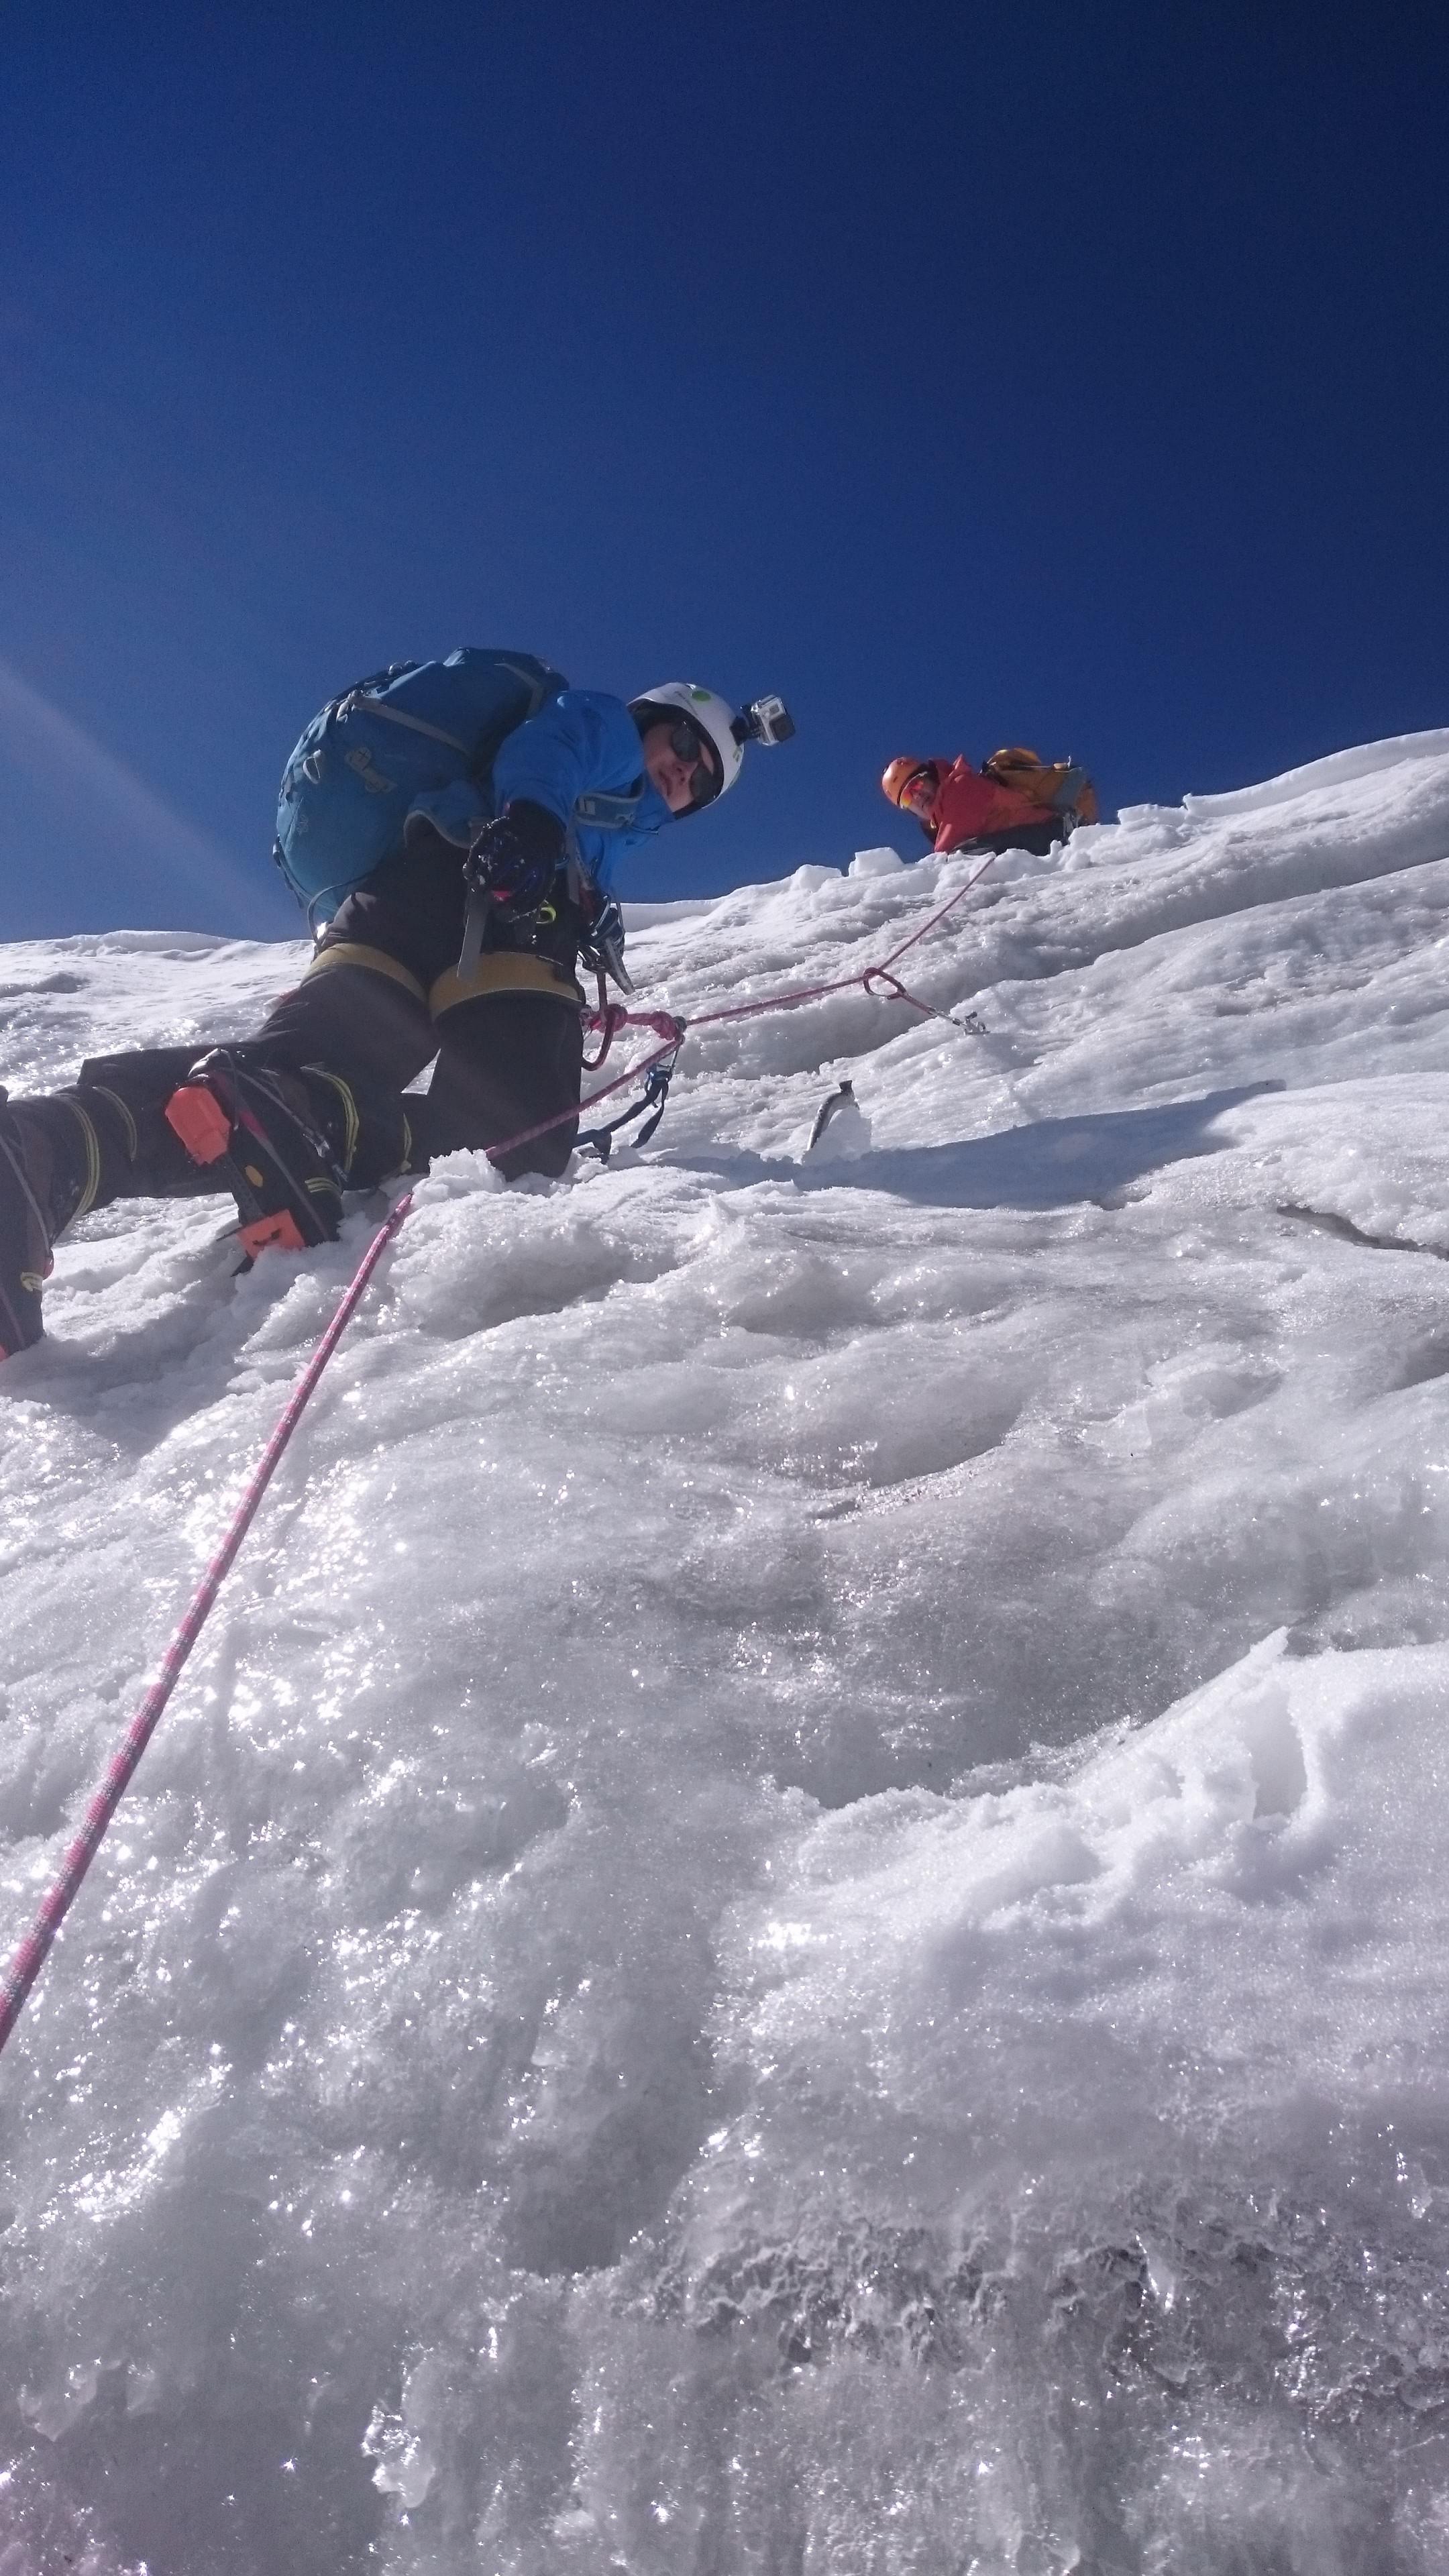 alpin is ca 3300 moh.